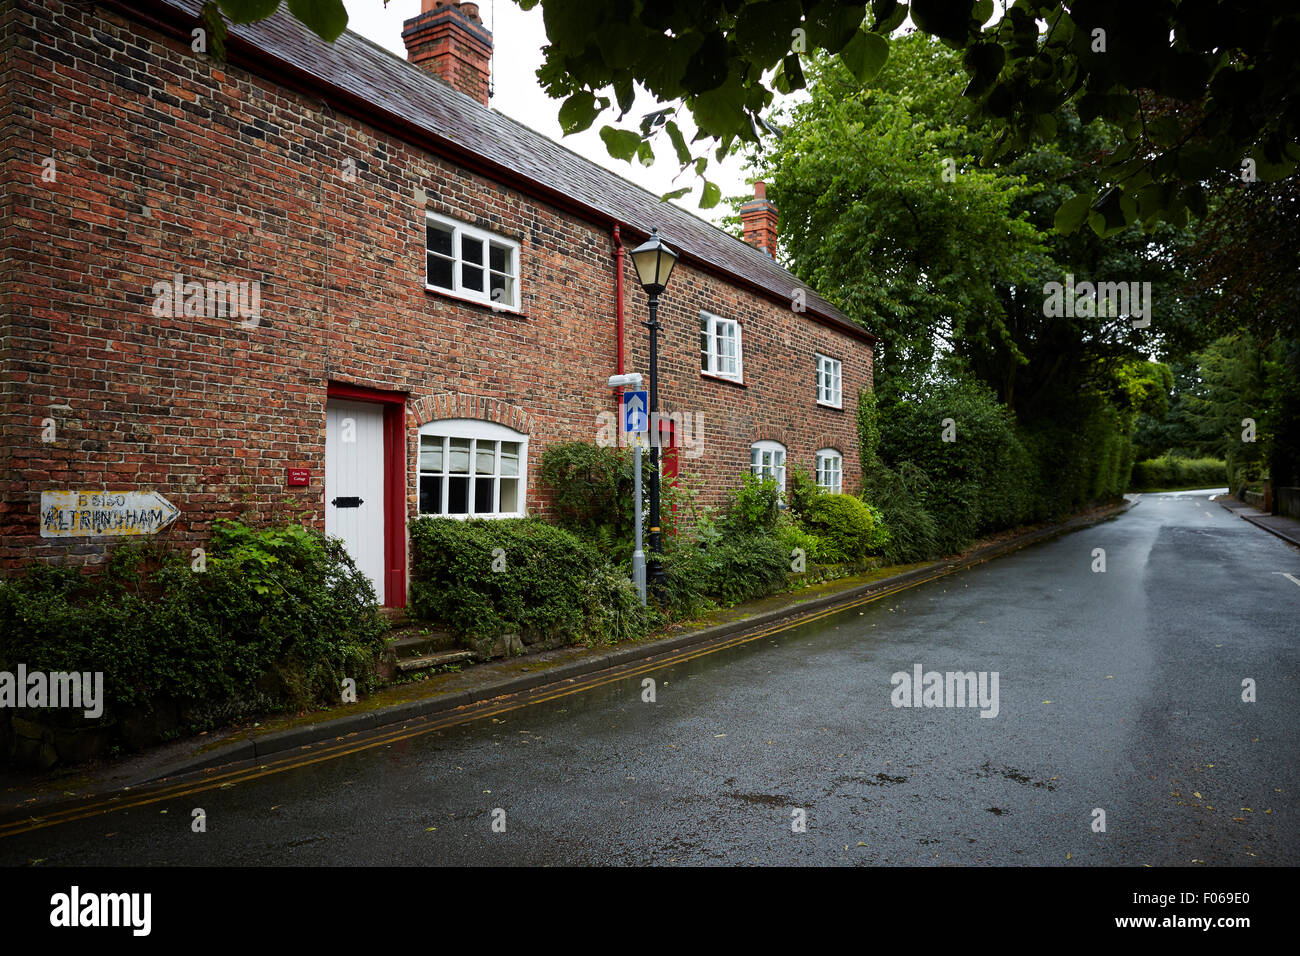 Dunham Massey Village  nr Altrincham  UK Great Britain British United Kingdom Europe European island England English - Stock Image